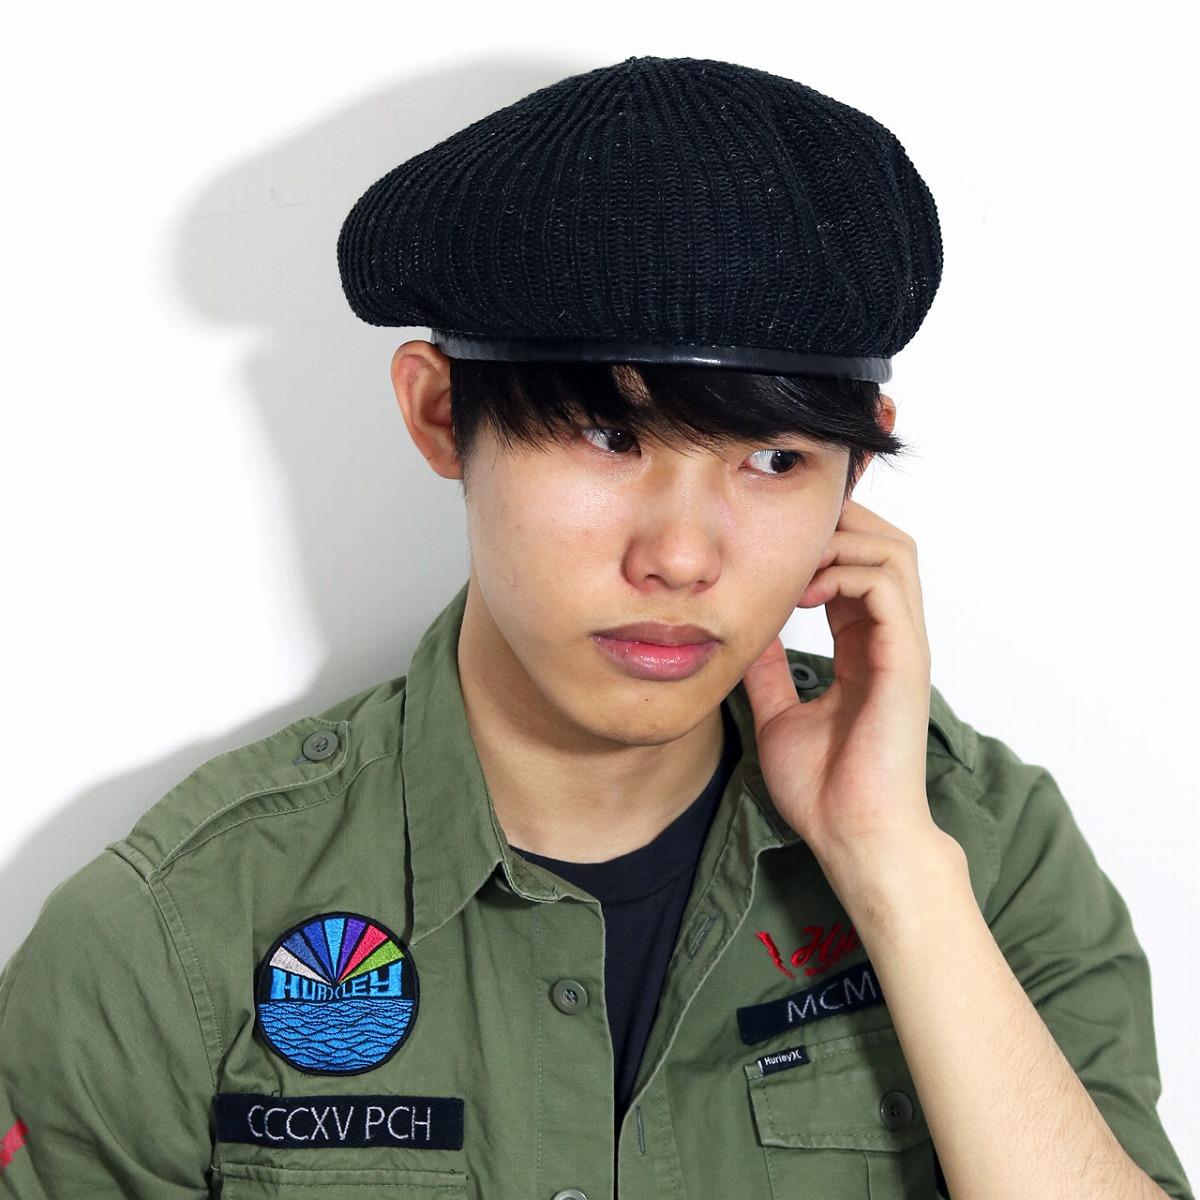 a39f5944bce9a ELEHELM HAT STORE  Beret summer knit hemp rib army beret hat Lady s men  beret unisex 57.5cm army military beret Monty beret black black  beret   Father s Day ...